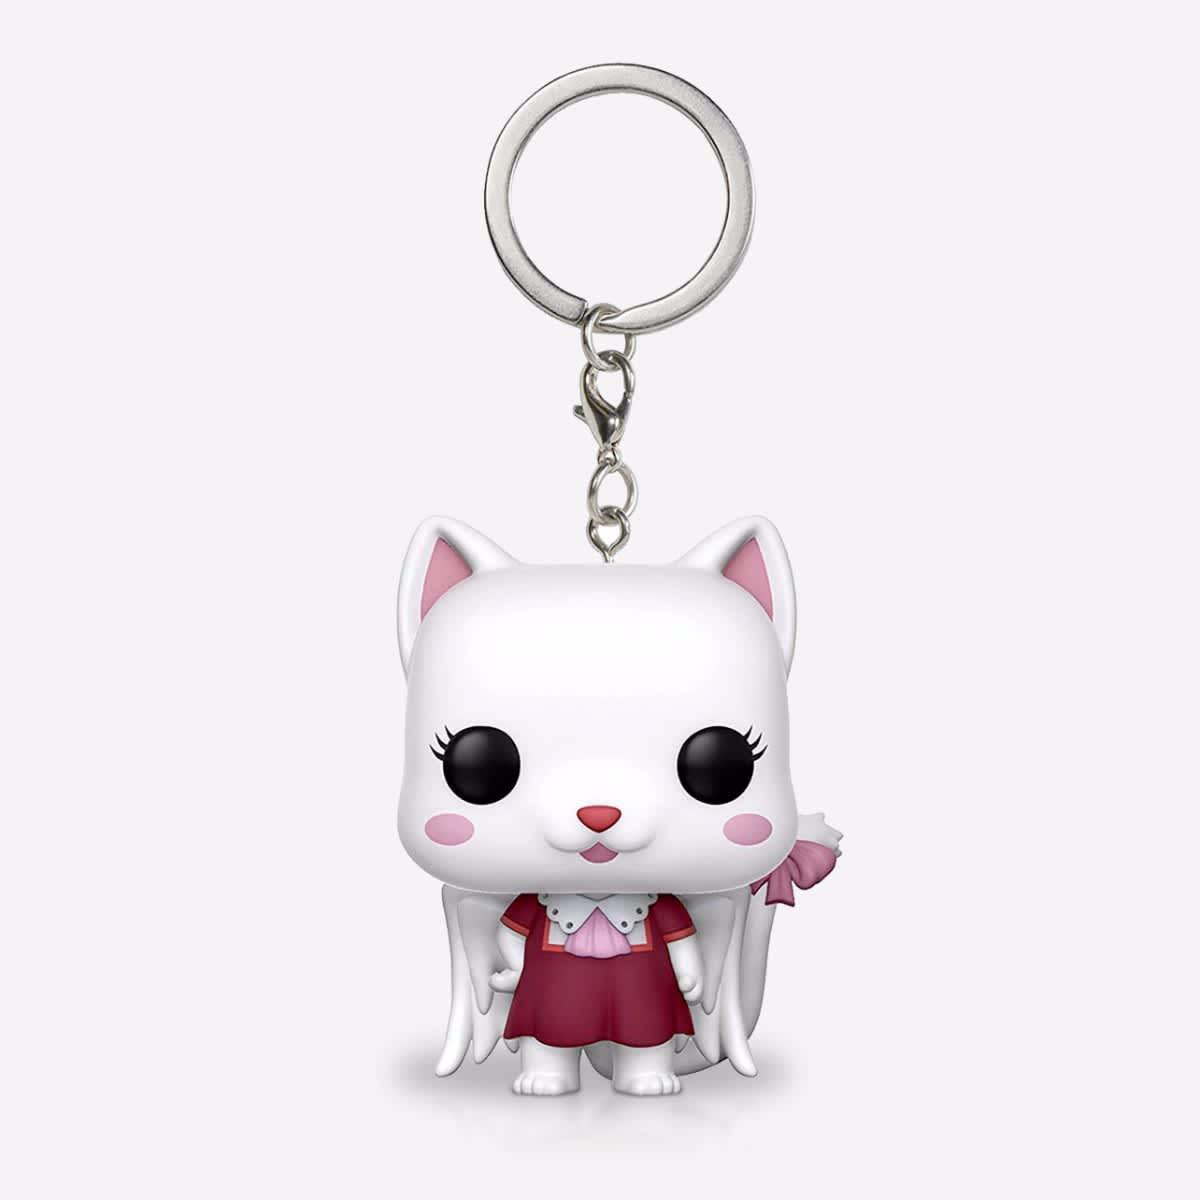 Funko Pocket Pop Keychain - Carla accessories